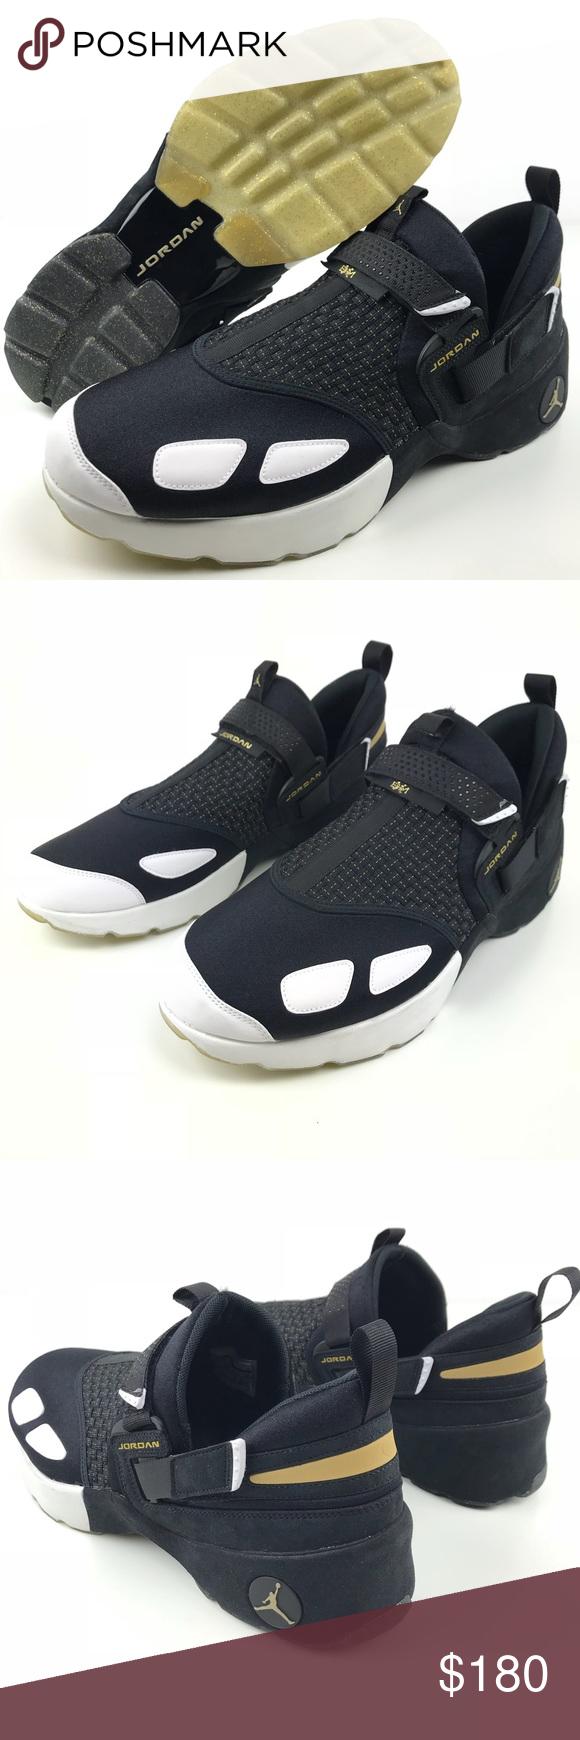 huge discount e3614 32992 New Nike Air Jordan Trunner LX Black History Month New Nike Air Jordan  Trunner LX BHM